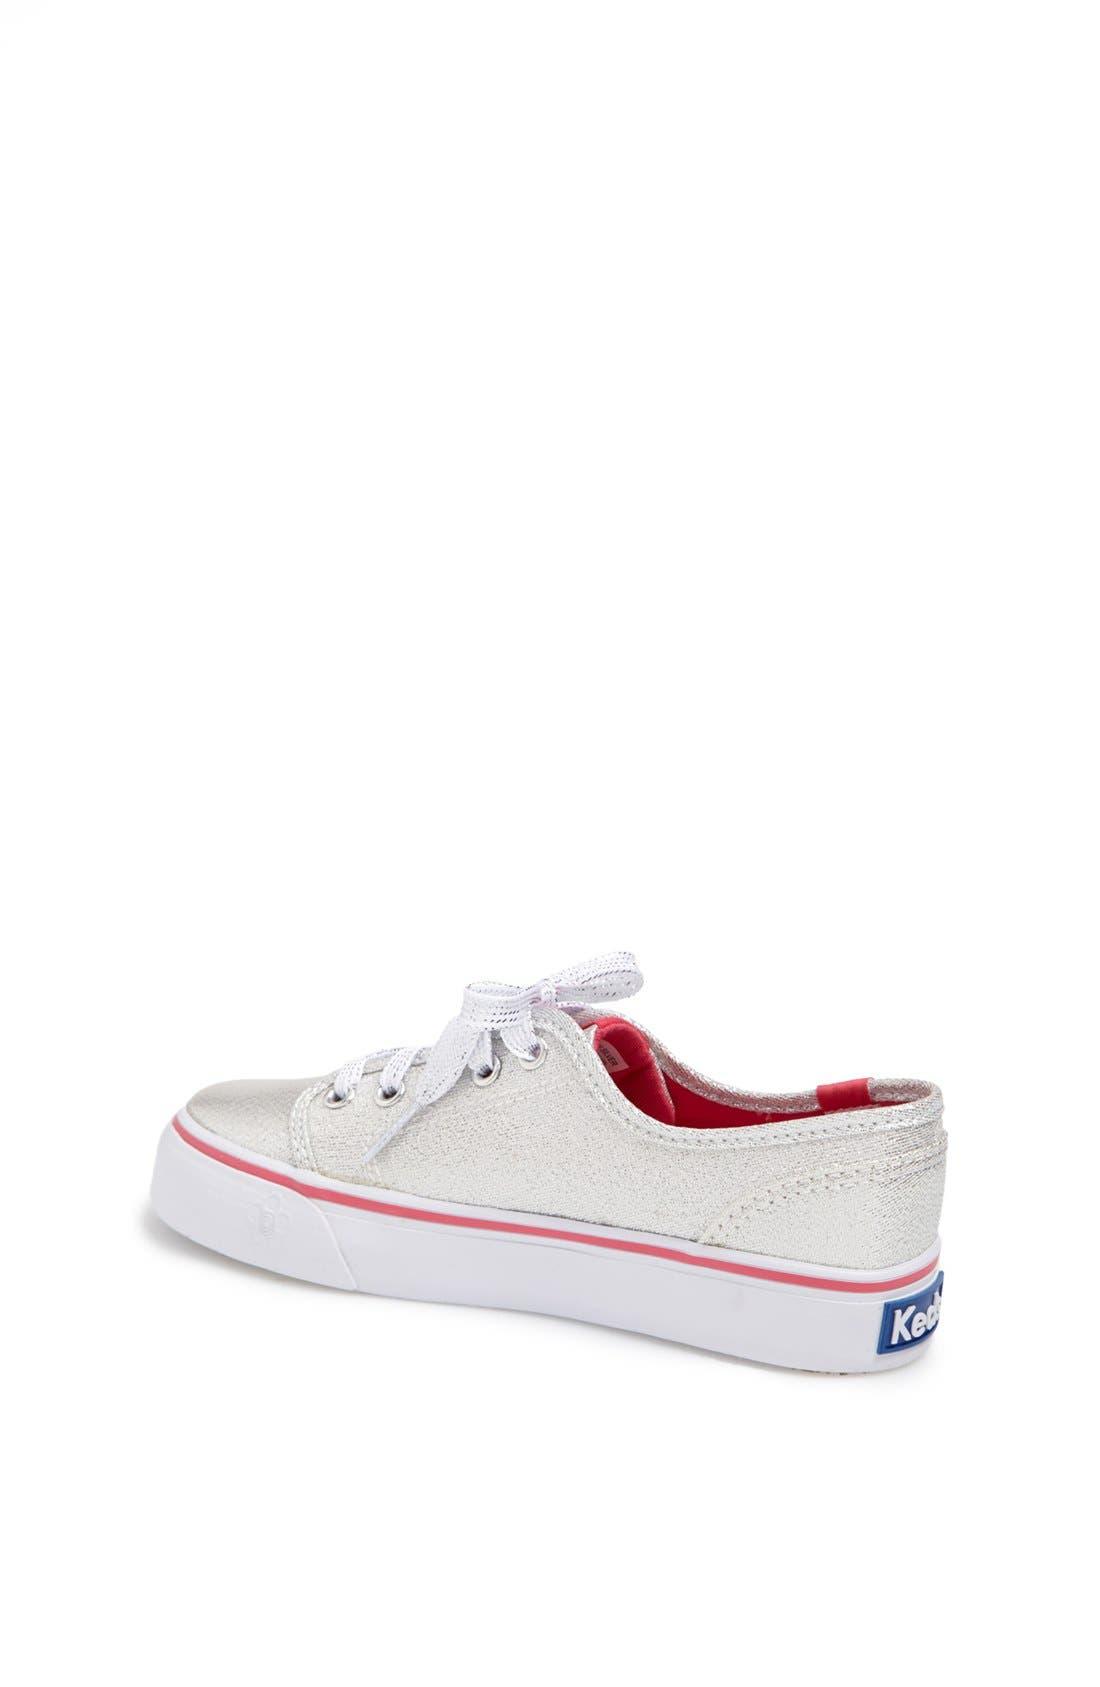 Alternate Image 2  - Keds® 'Double Dutch Shimmer' Sneaker (Toddler, Little Kid & Big Kid)